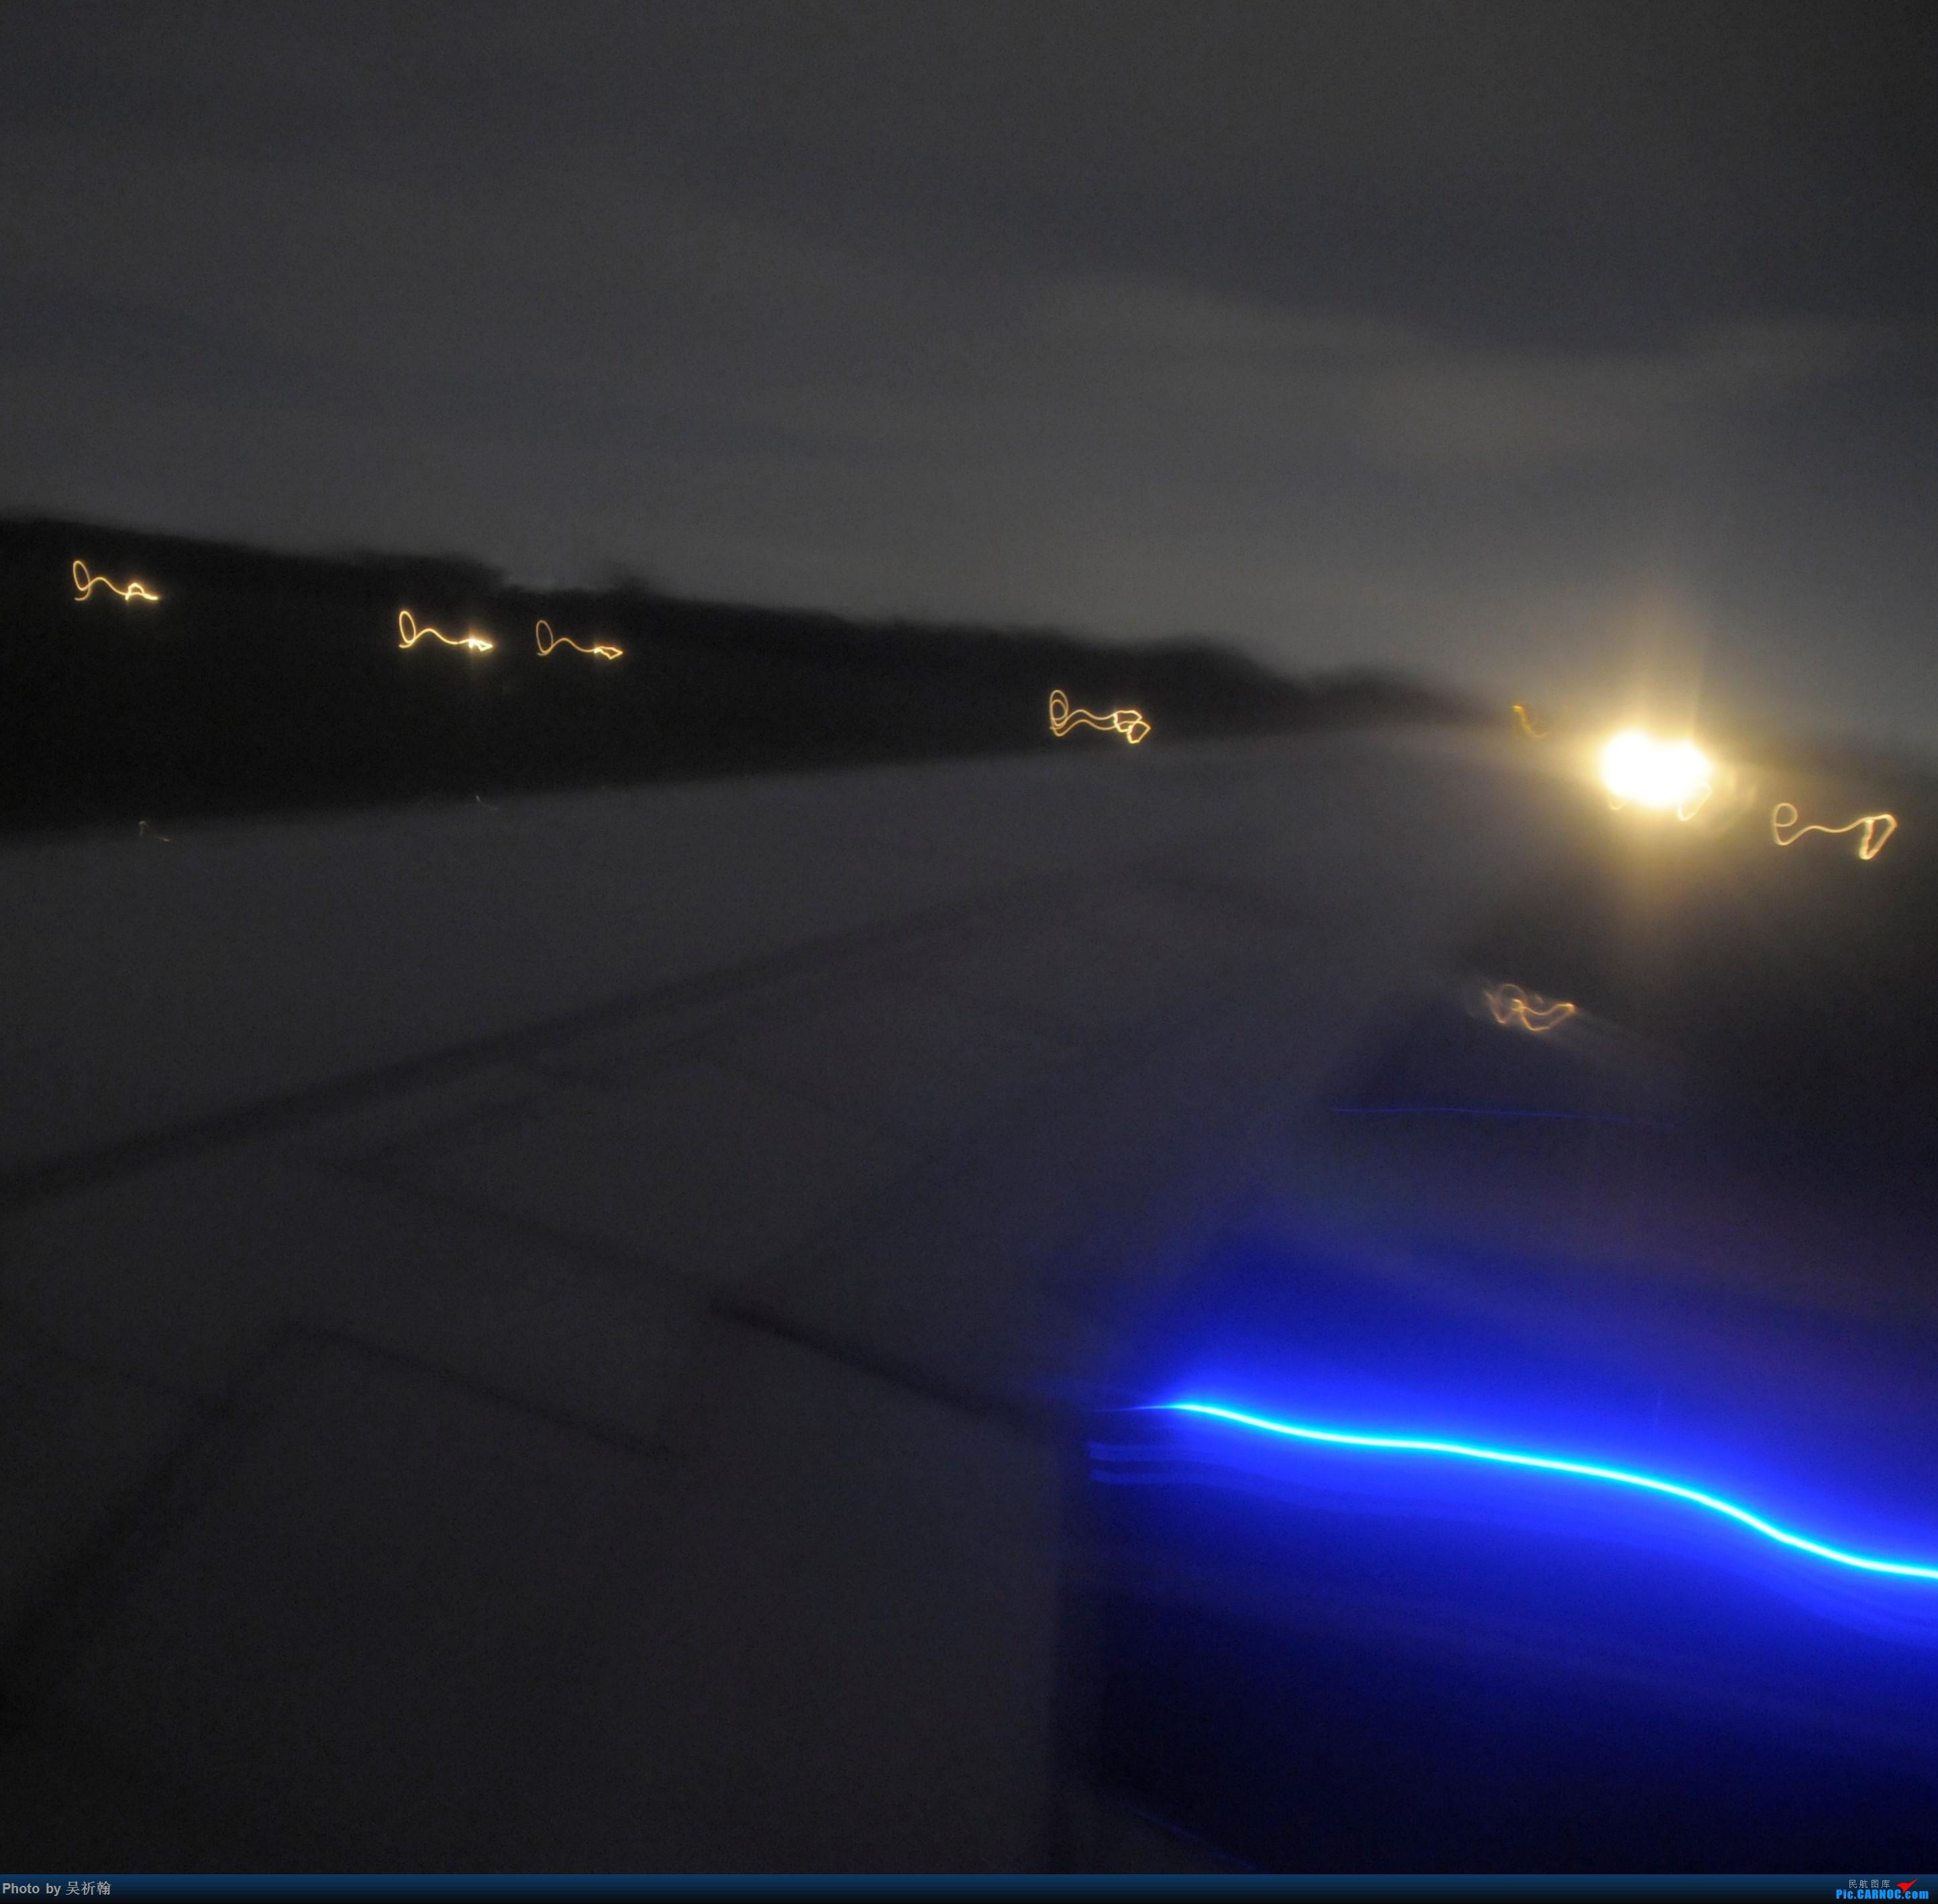 Re:[原创]Kian的飞行游记1:飞往无锡 机翼